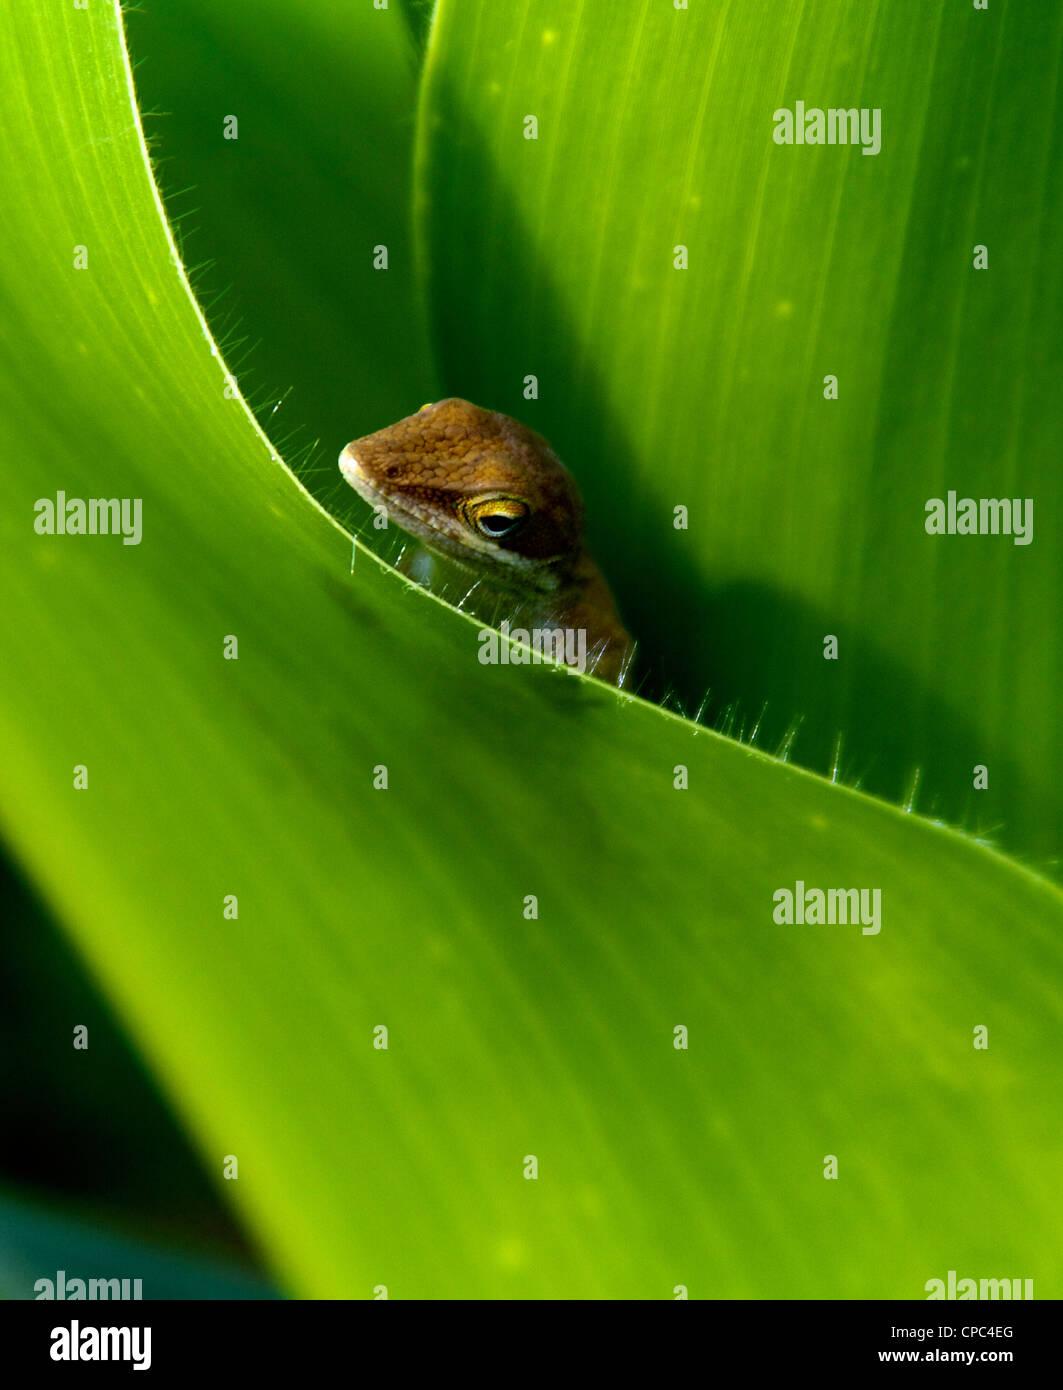 Green chameleon saying Hello - Stock Image